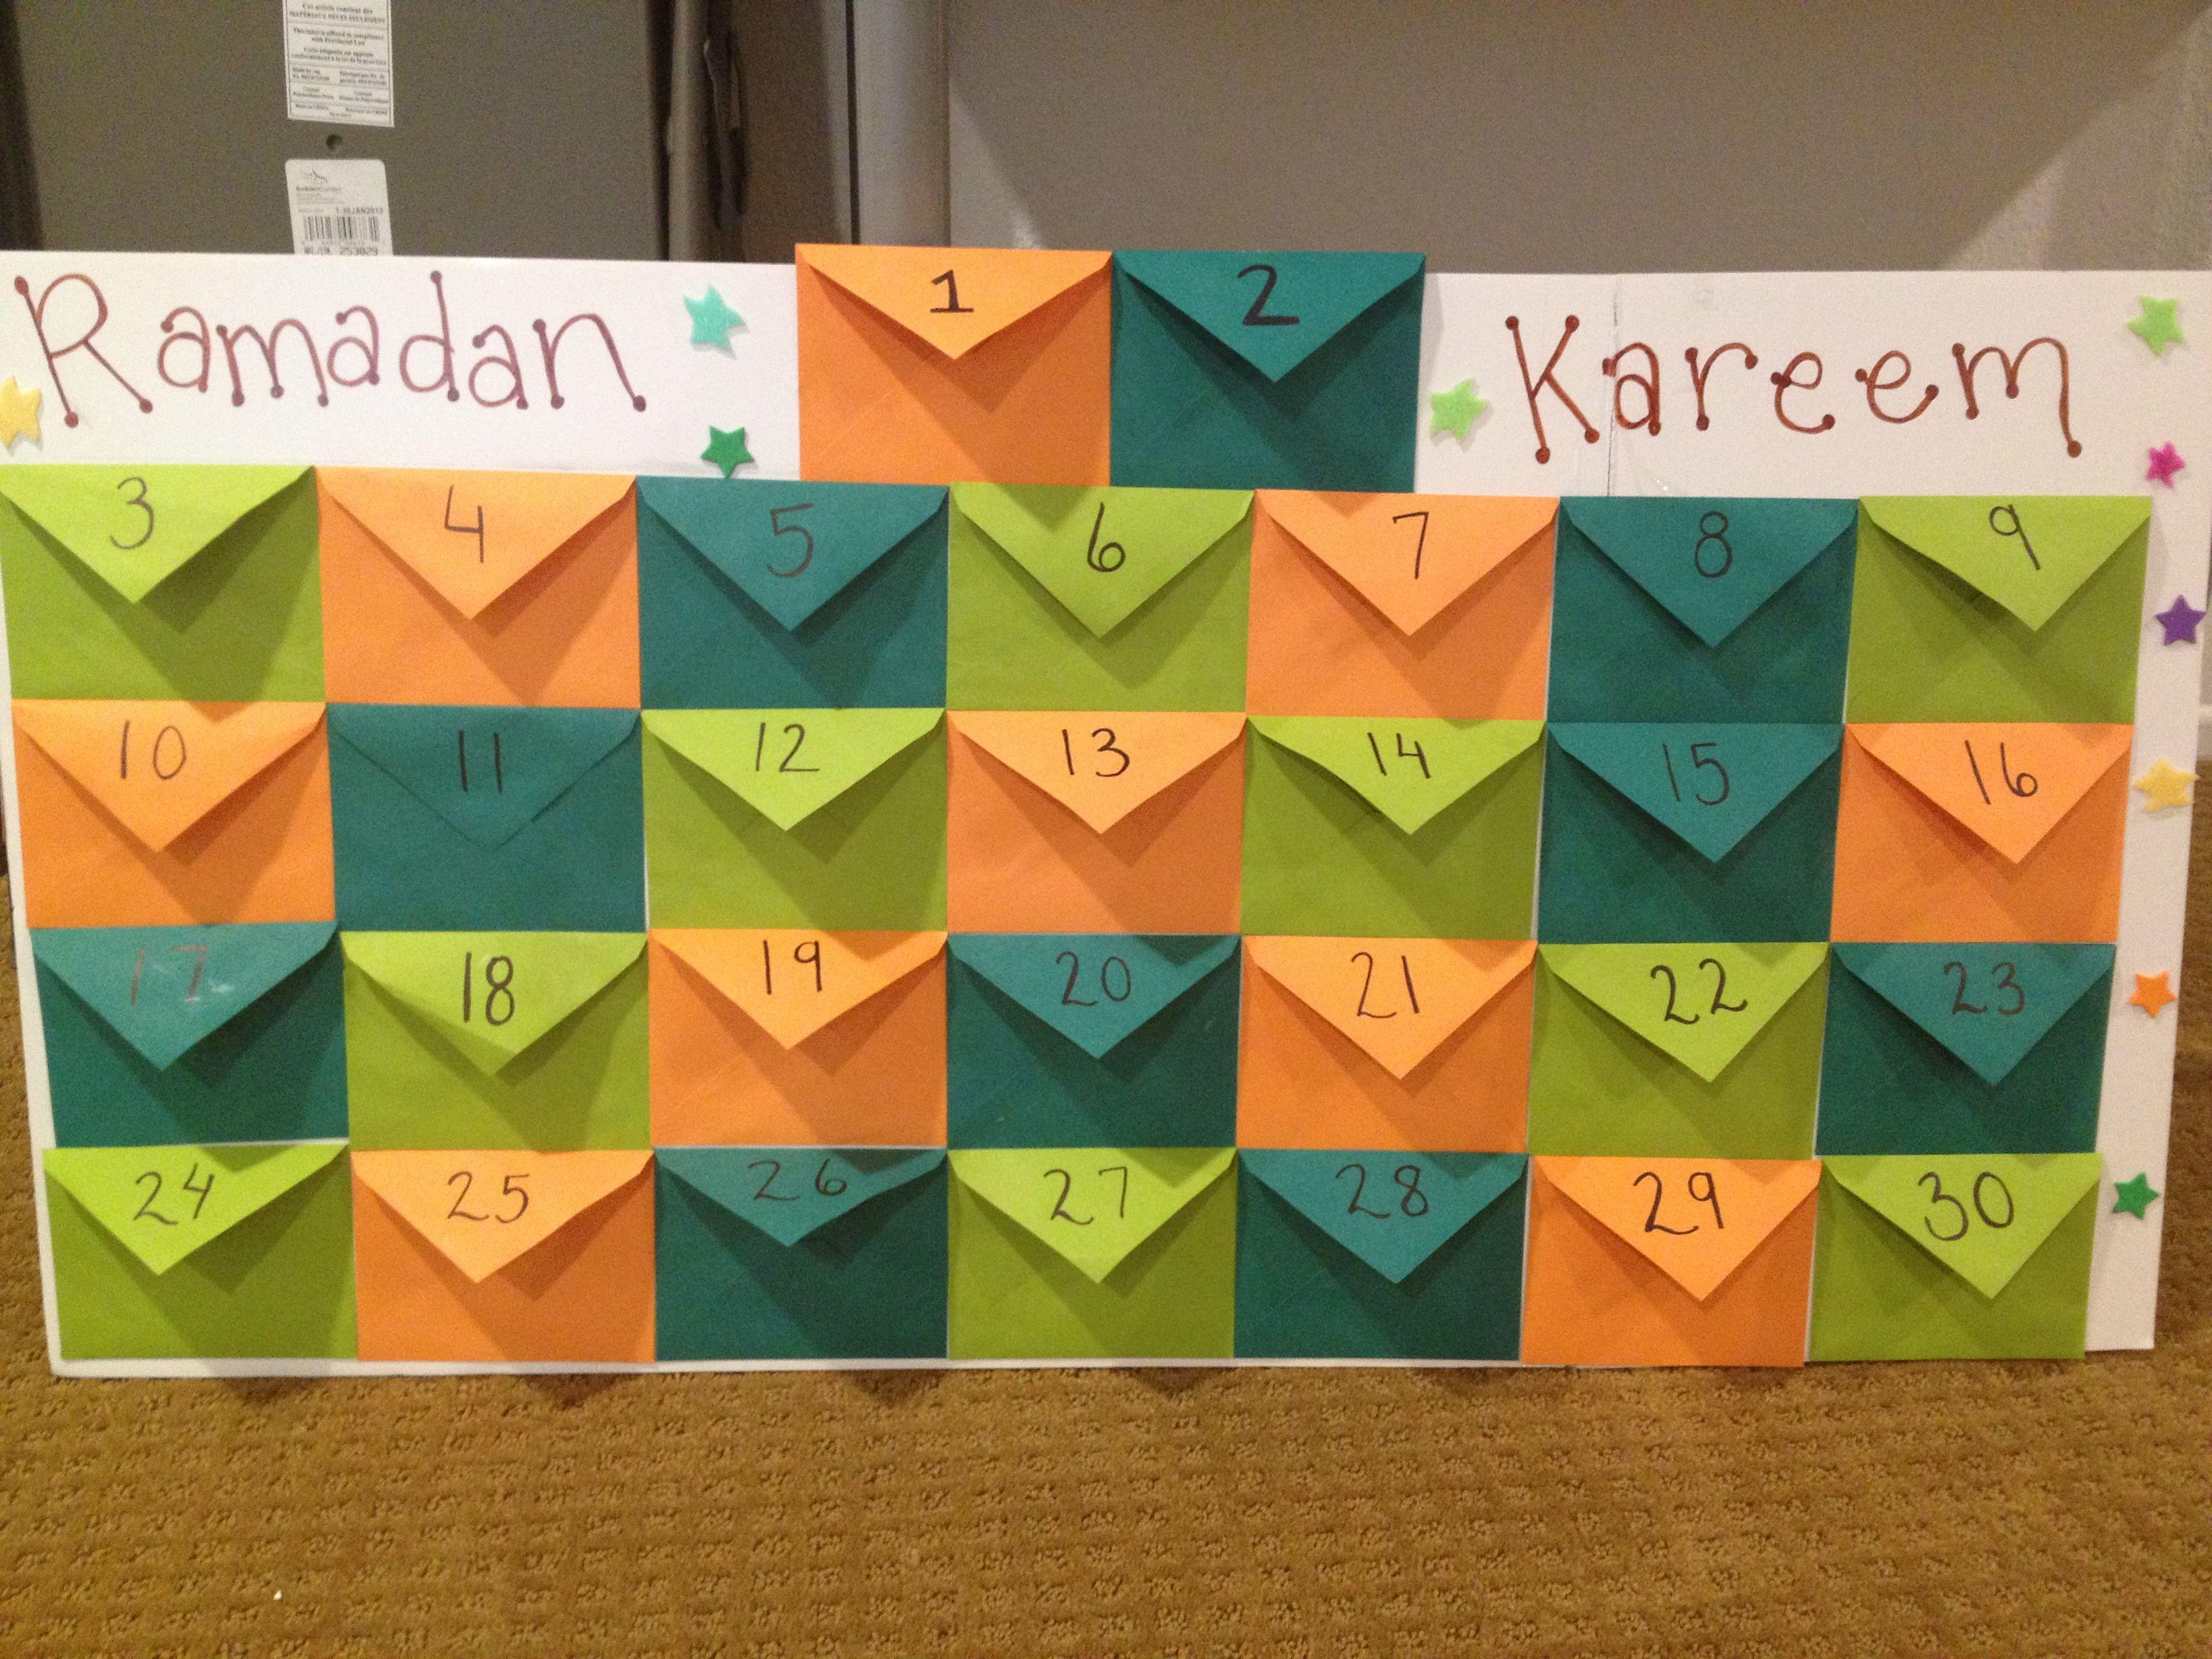 Ramadan Advent Calendar Each Flap Reveals A Hadith To Learn Or Good Deed